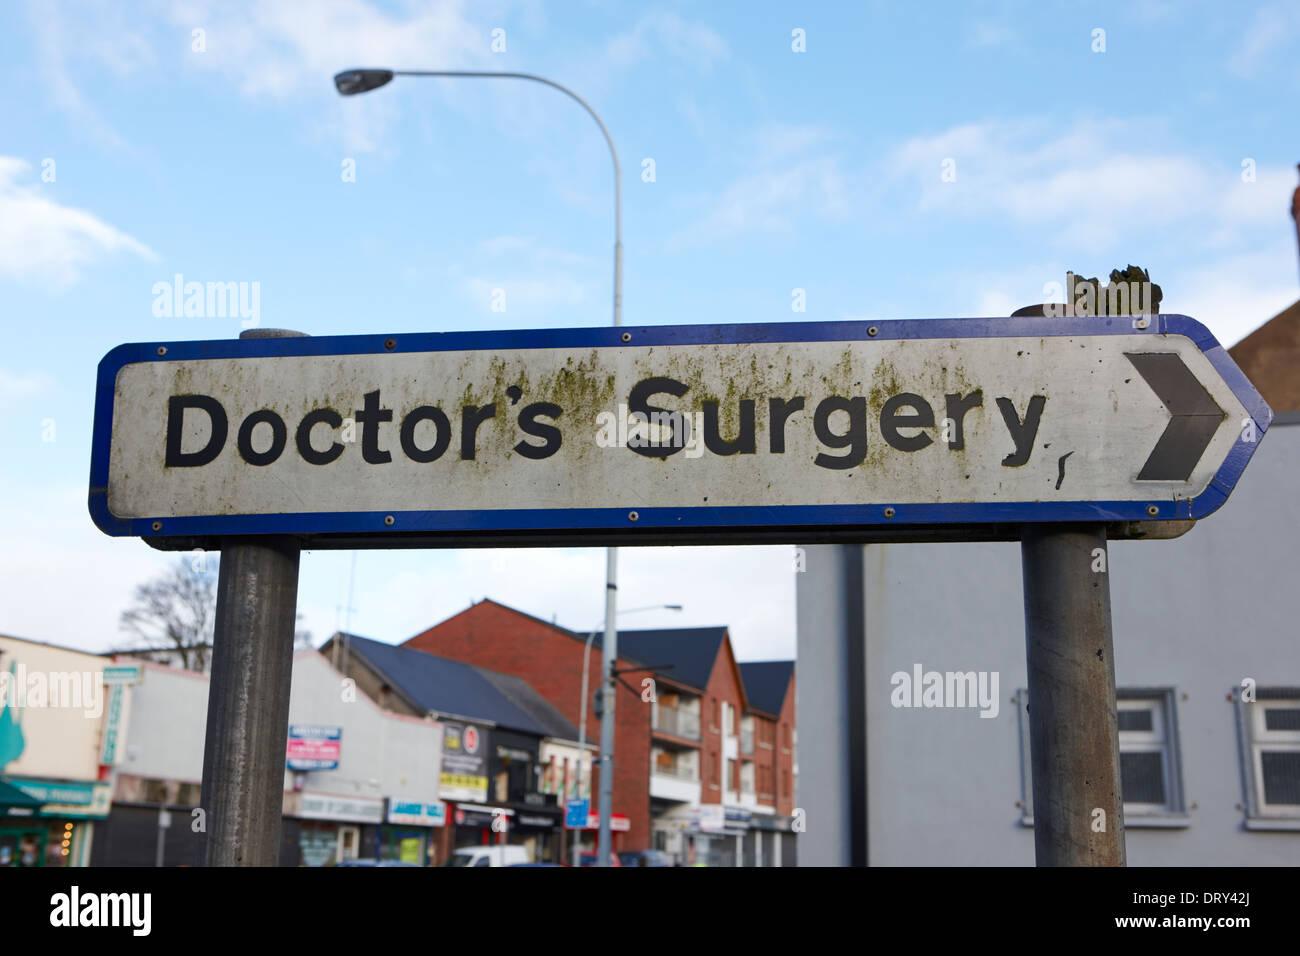 sign for local doctors surgery dunmurry belfast uk - Stock Image